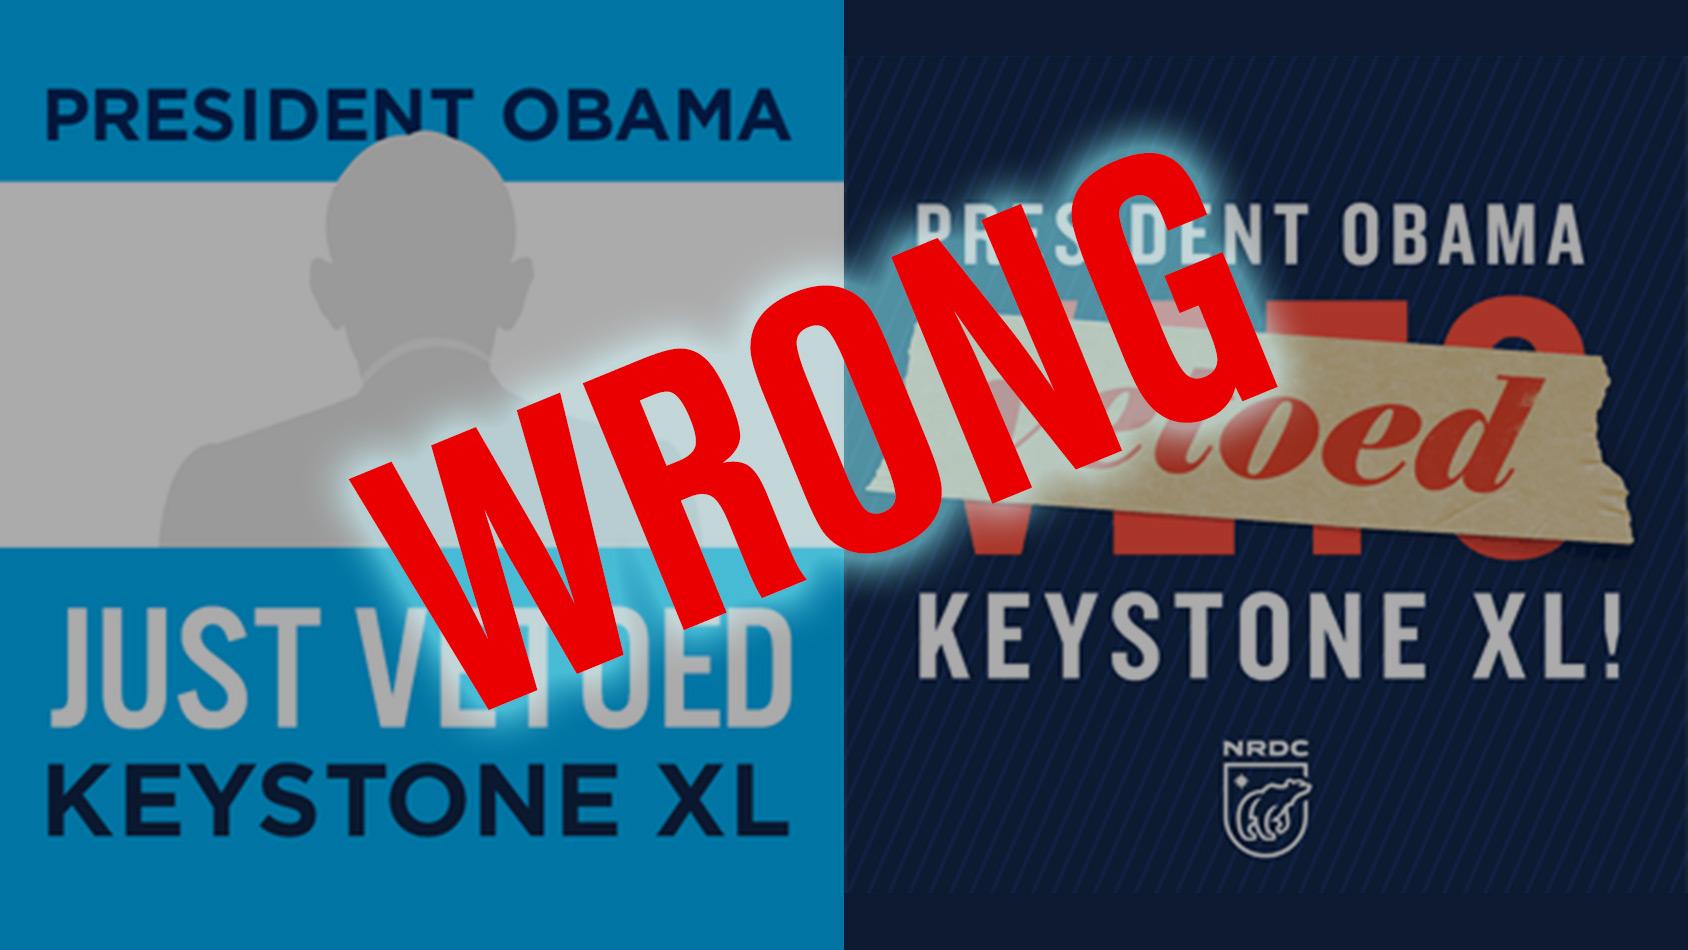 Obama vetoed Keystone? Wrong.